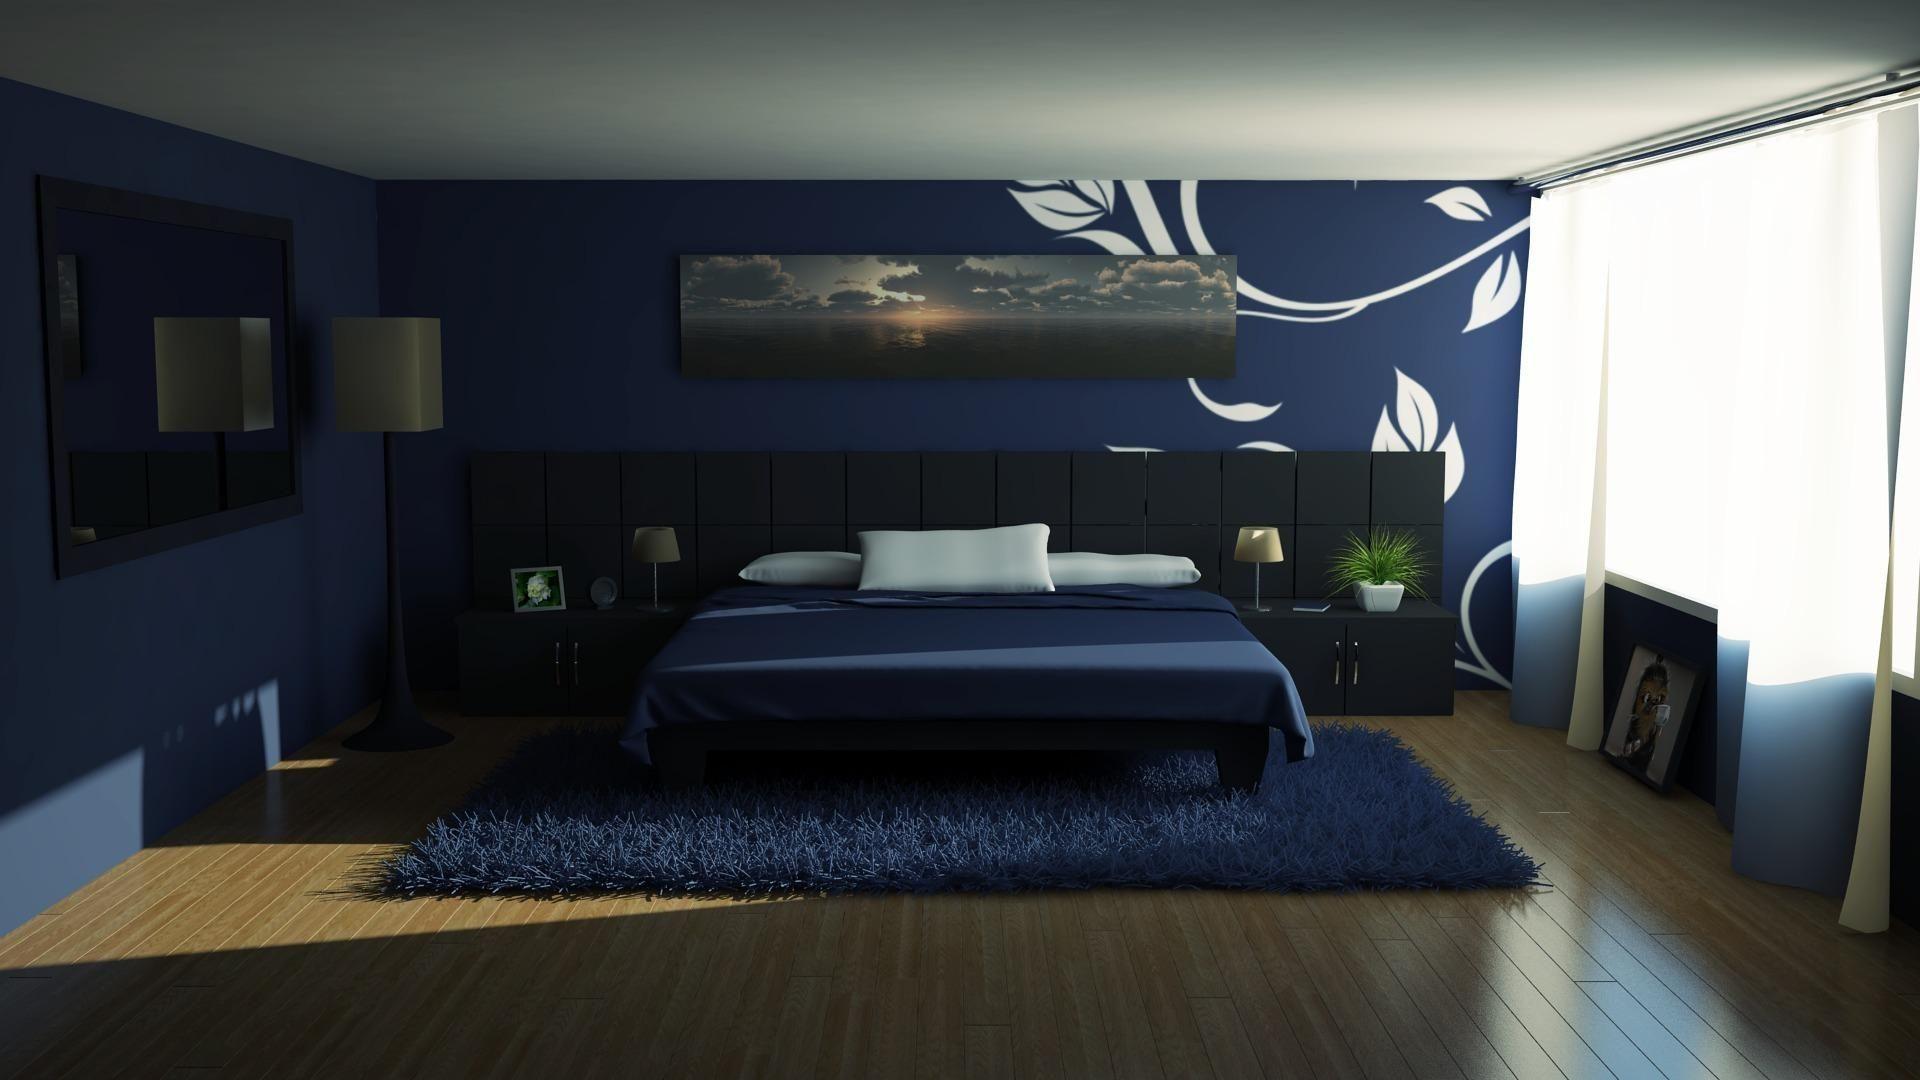 Beautiful Bedroom Design Hd Images Blue Room Decor Bedroom Blue